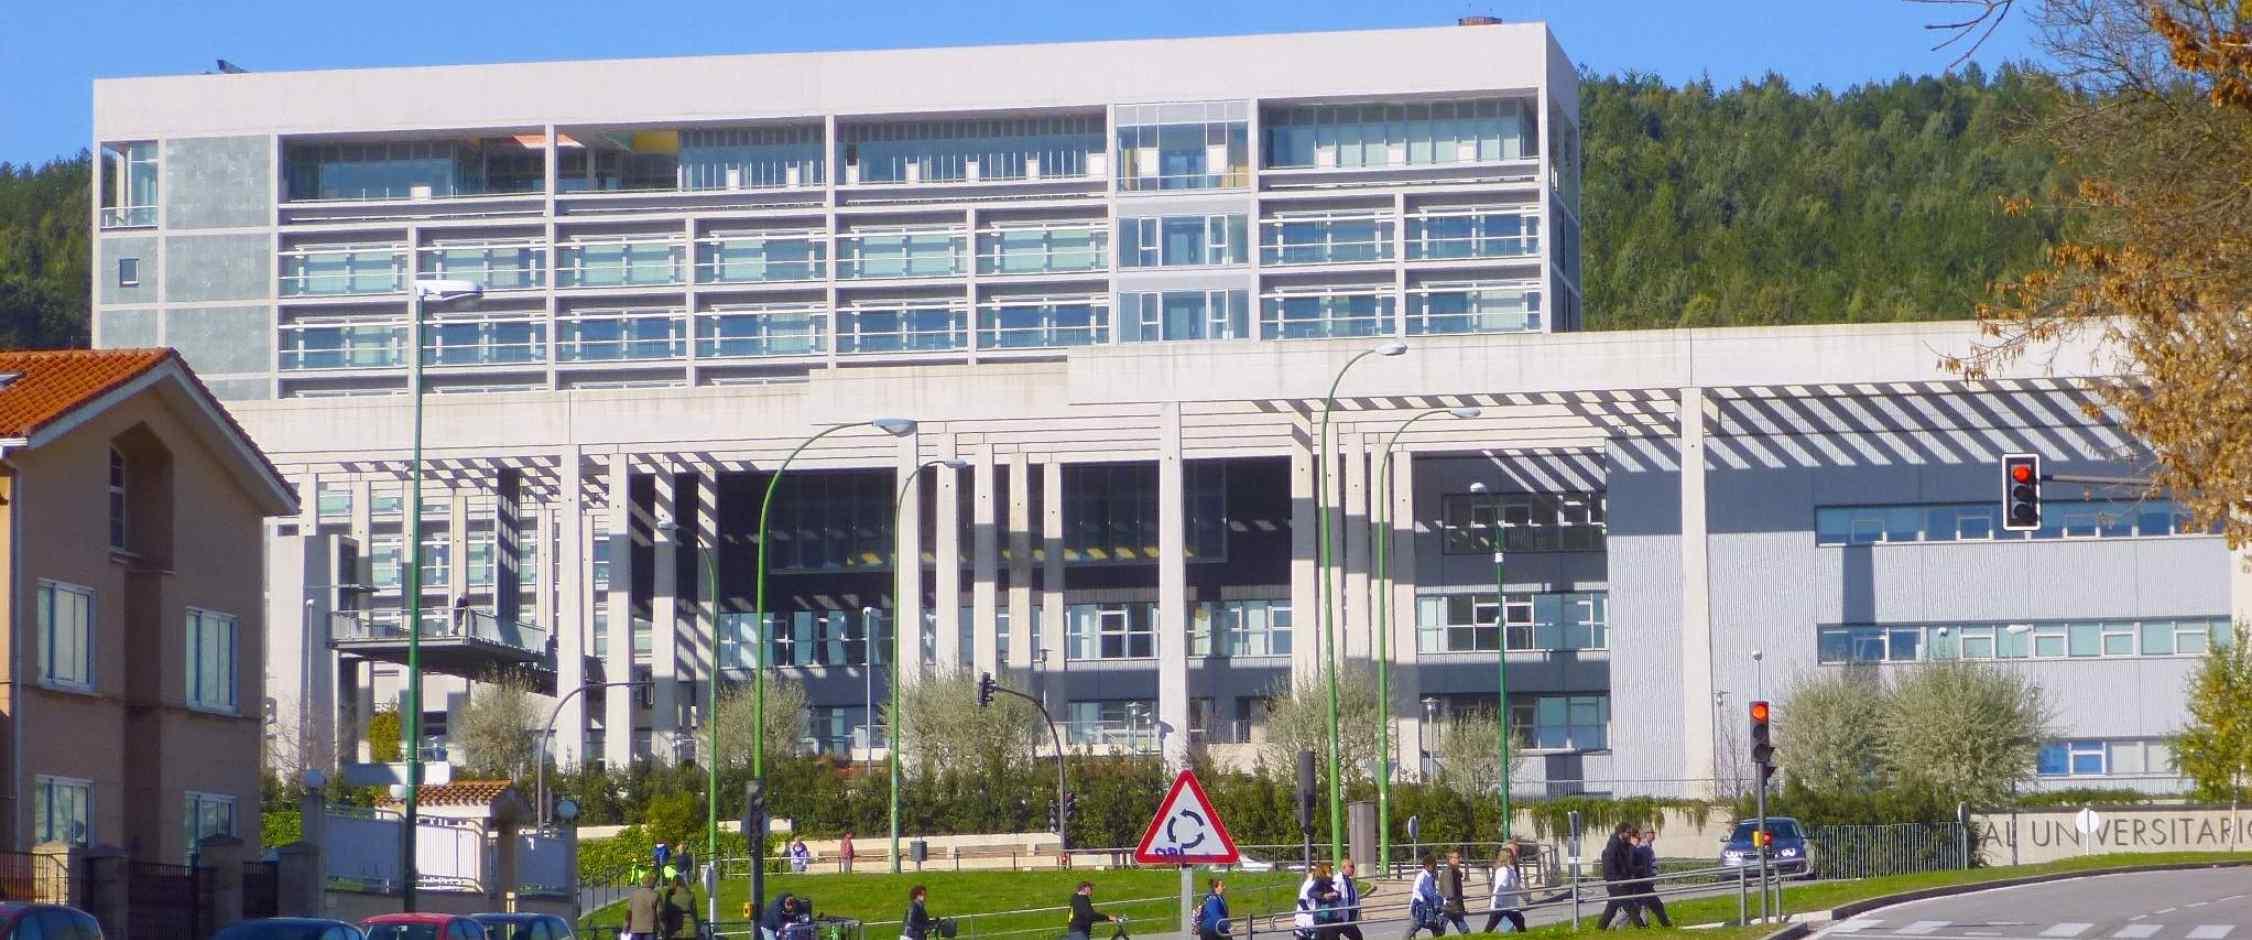 hospital-universitario-burgos-2